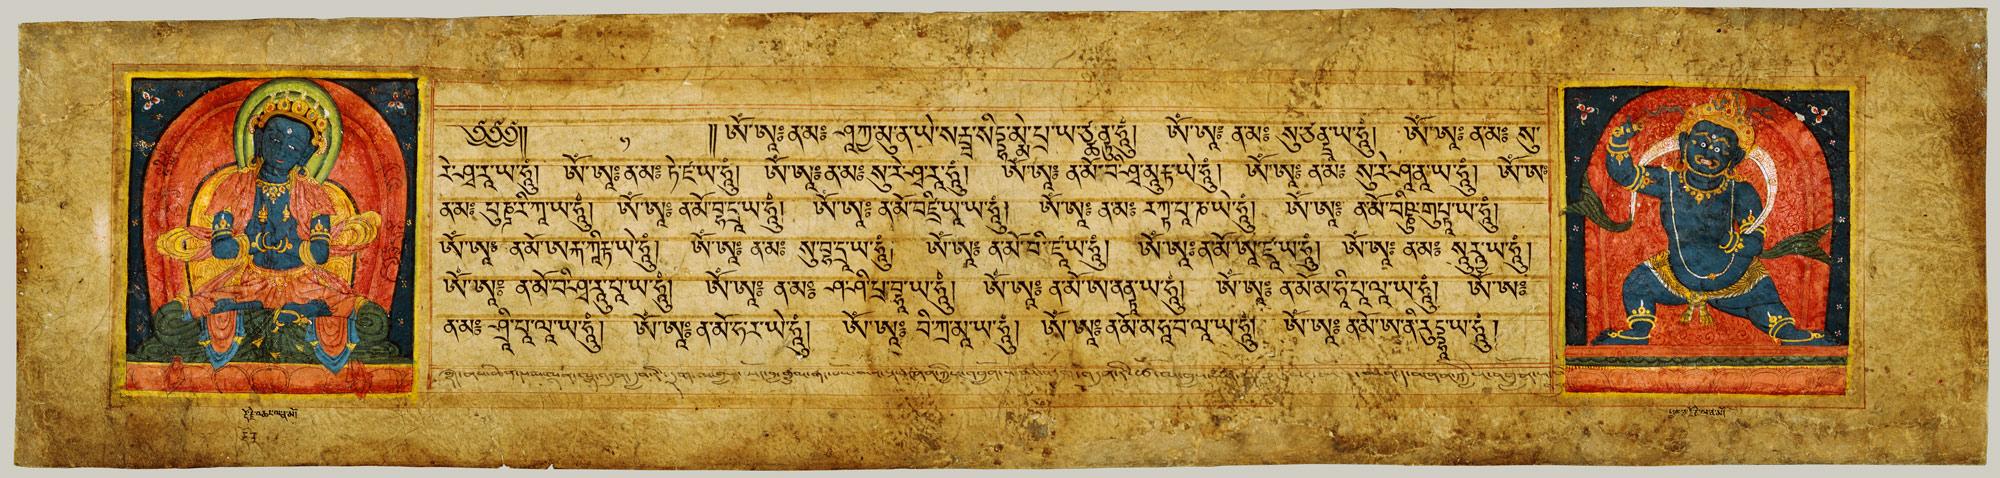 Tibetan Buddhist Art | Essay | Heilbrunn Timeline of Art History ...